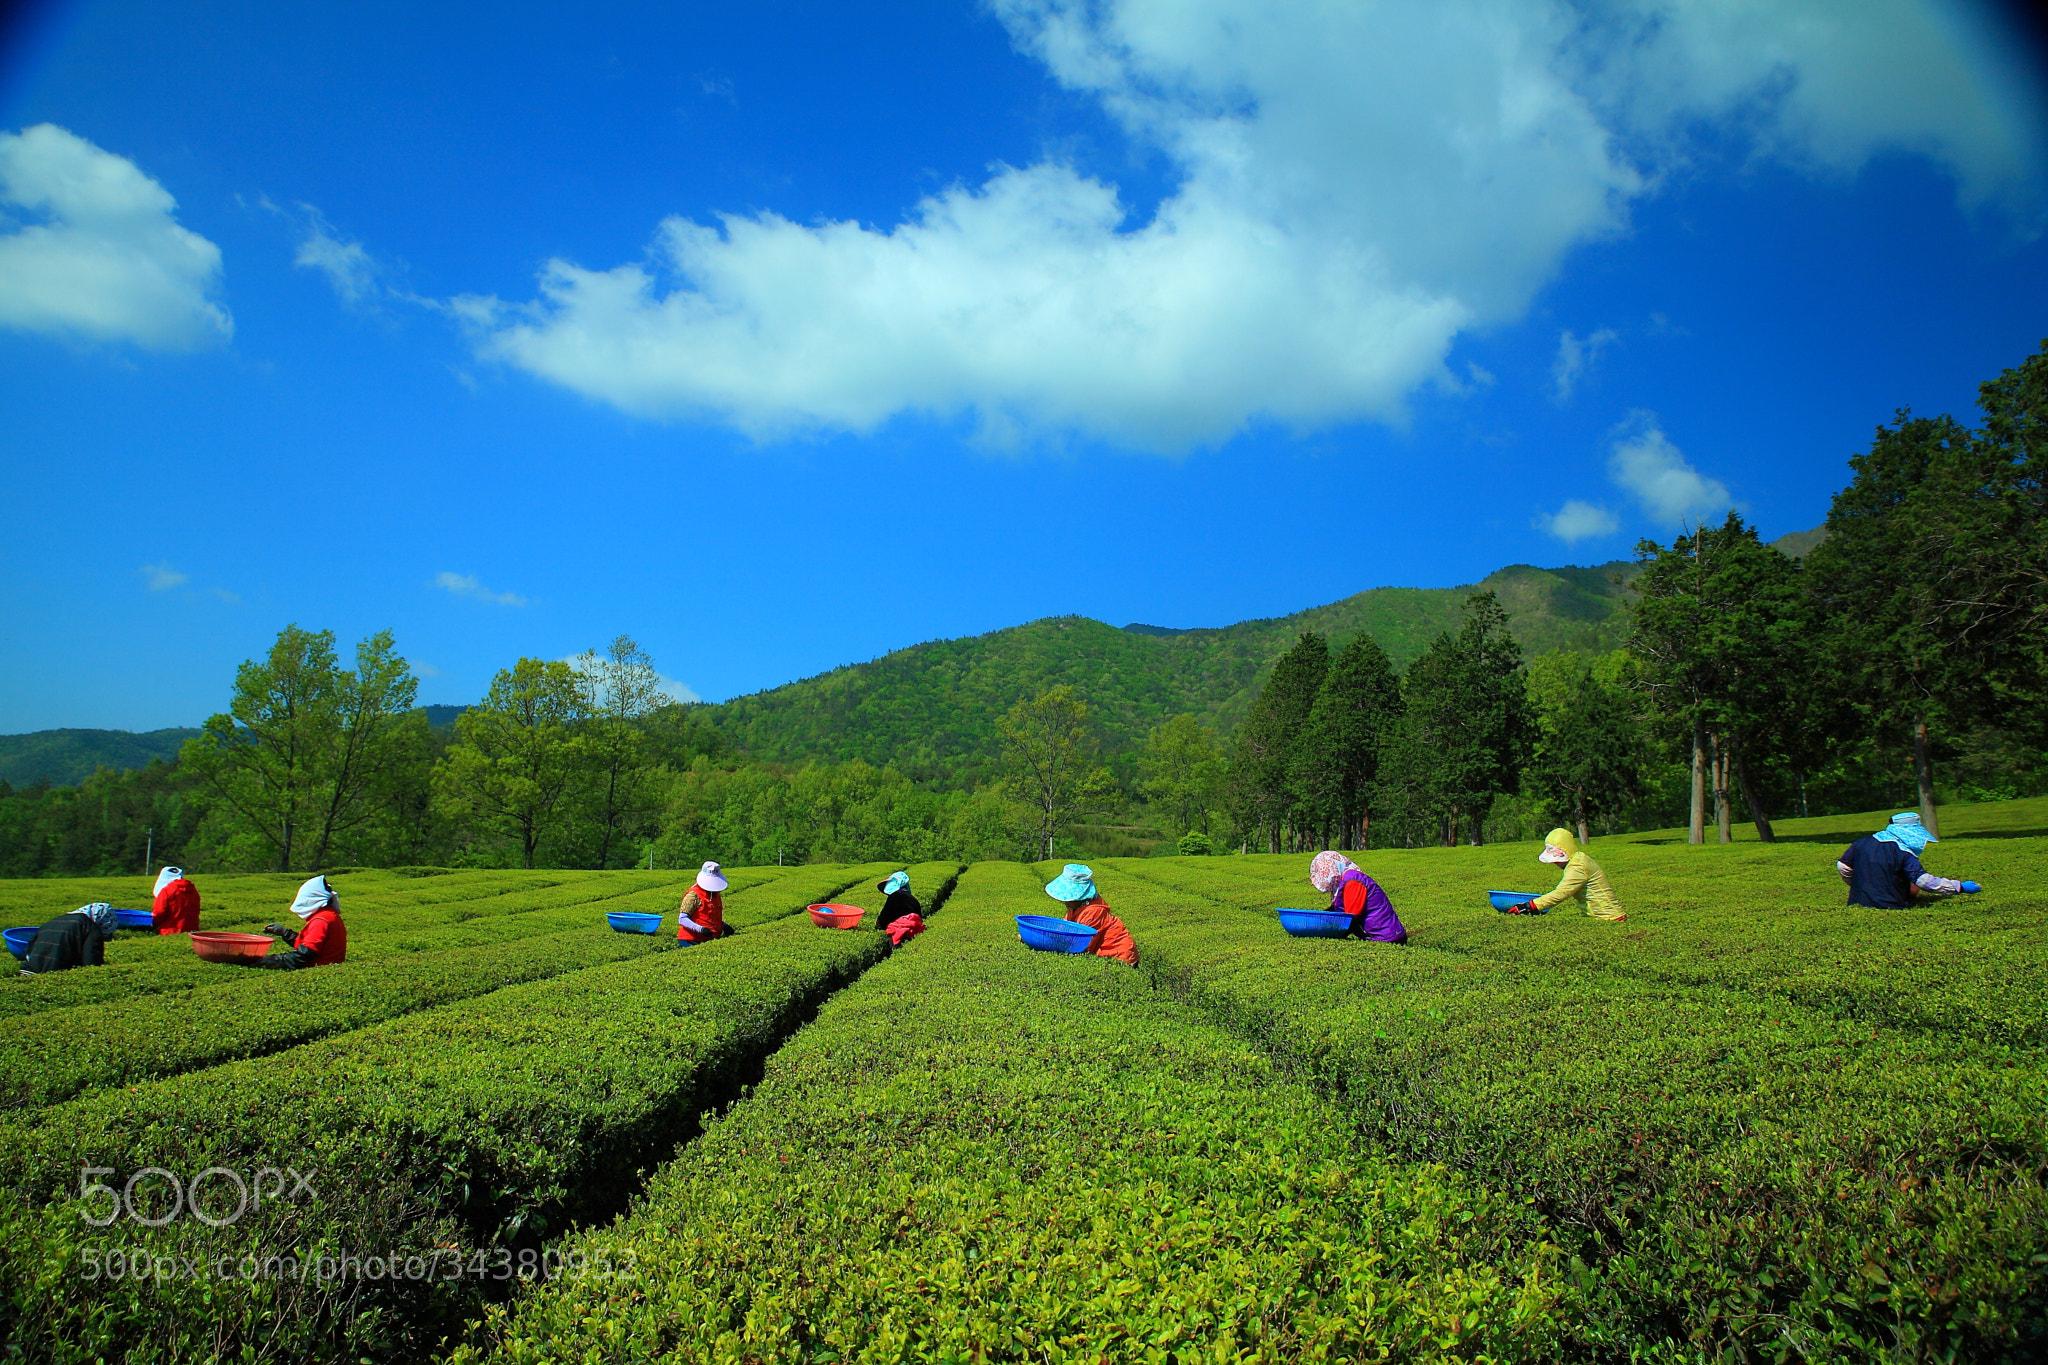 Photograph Green tea field landscape by 기문 kim on 500px